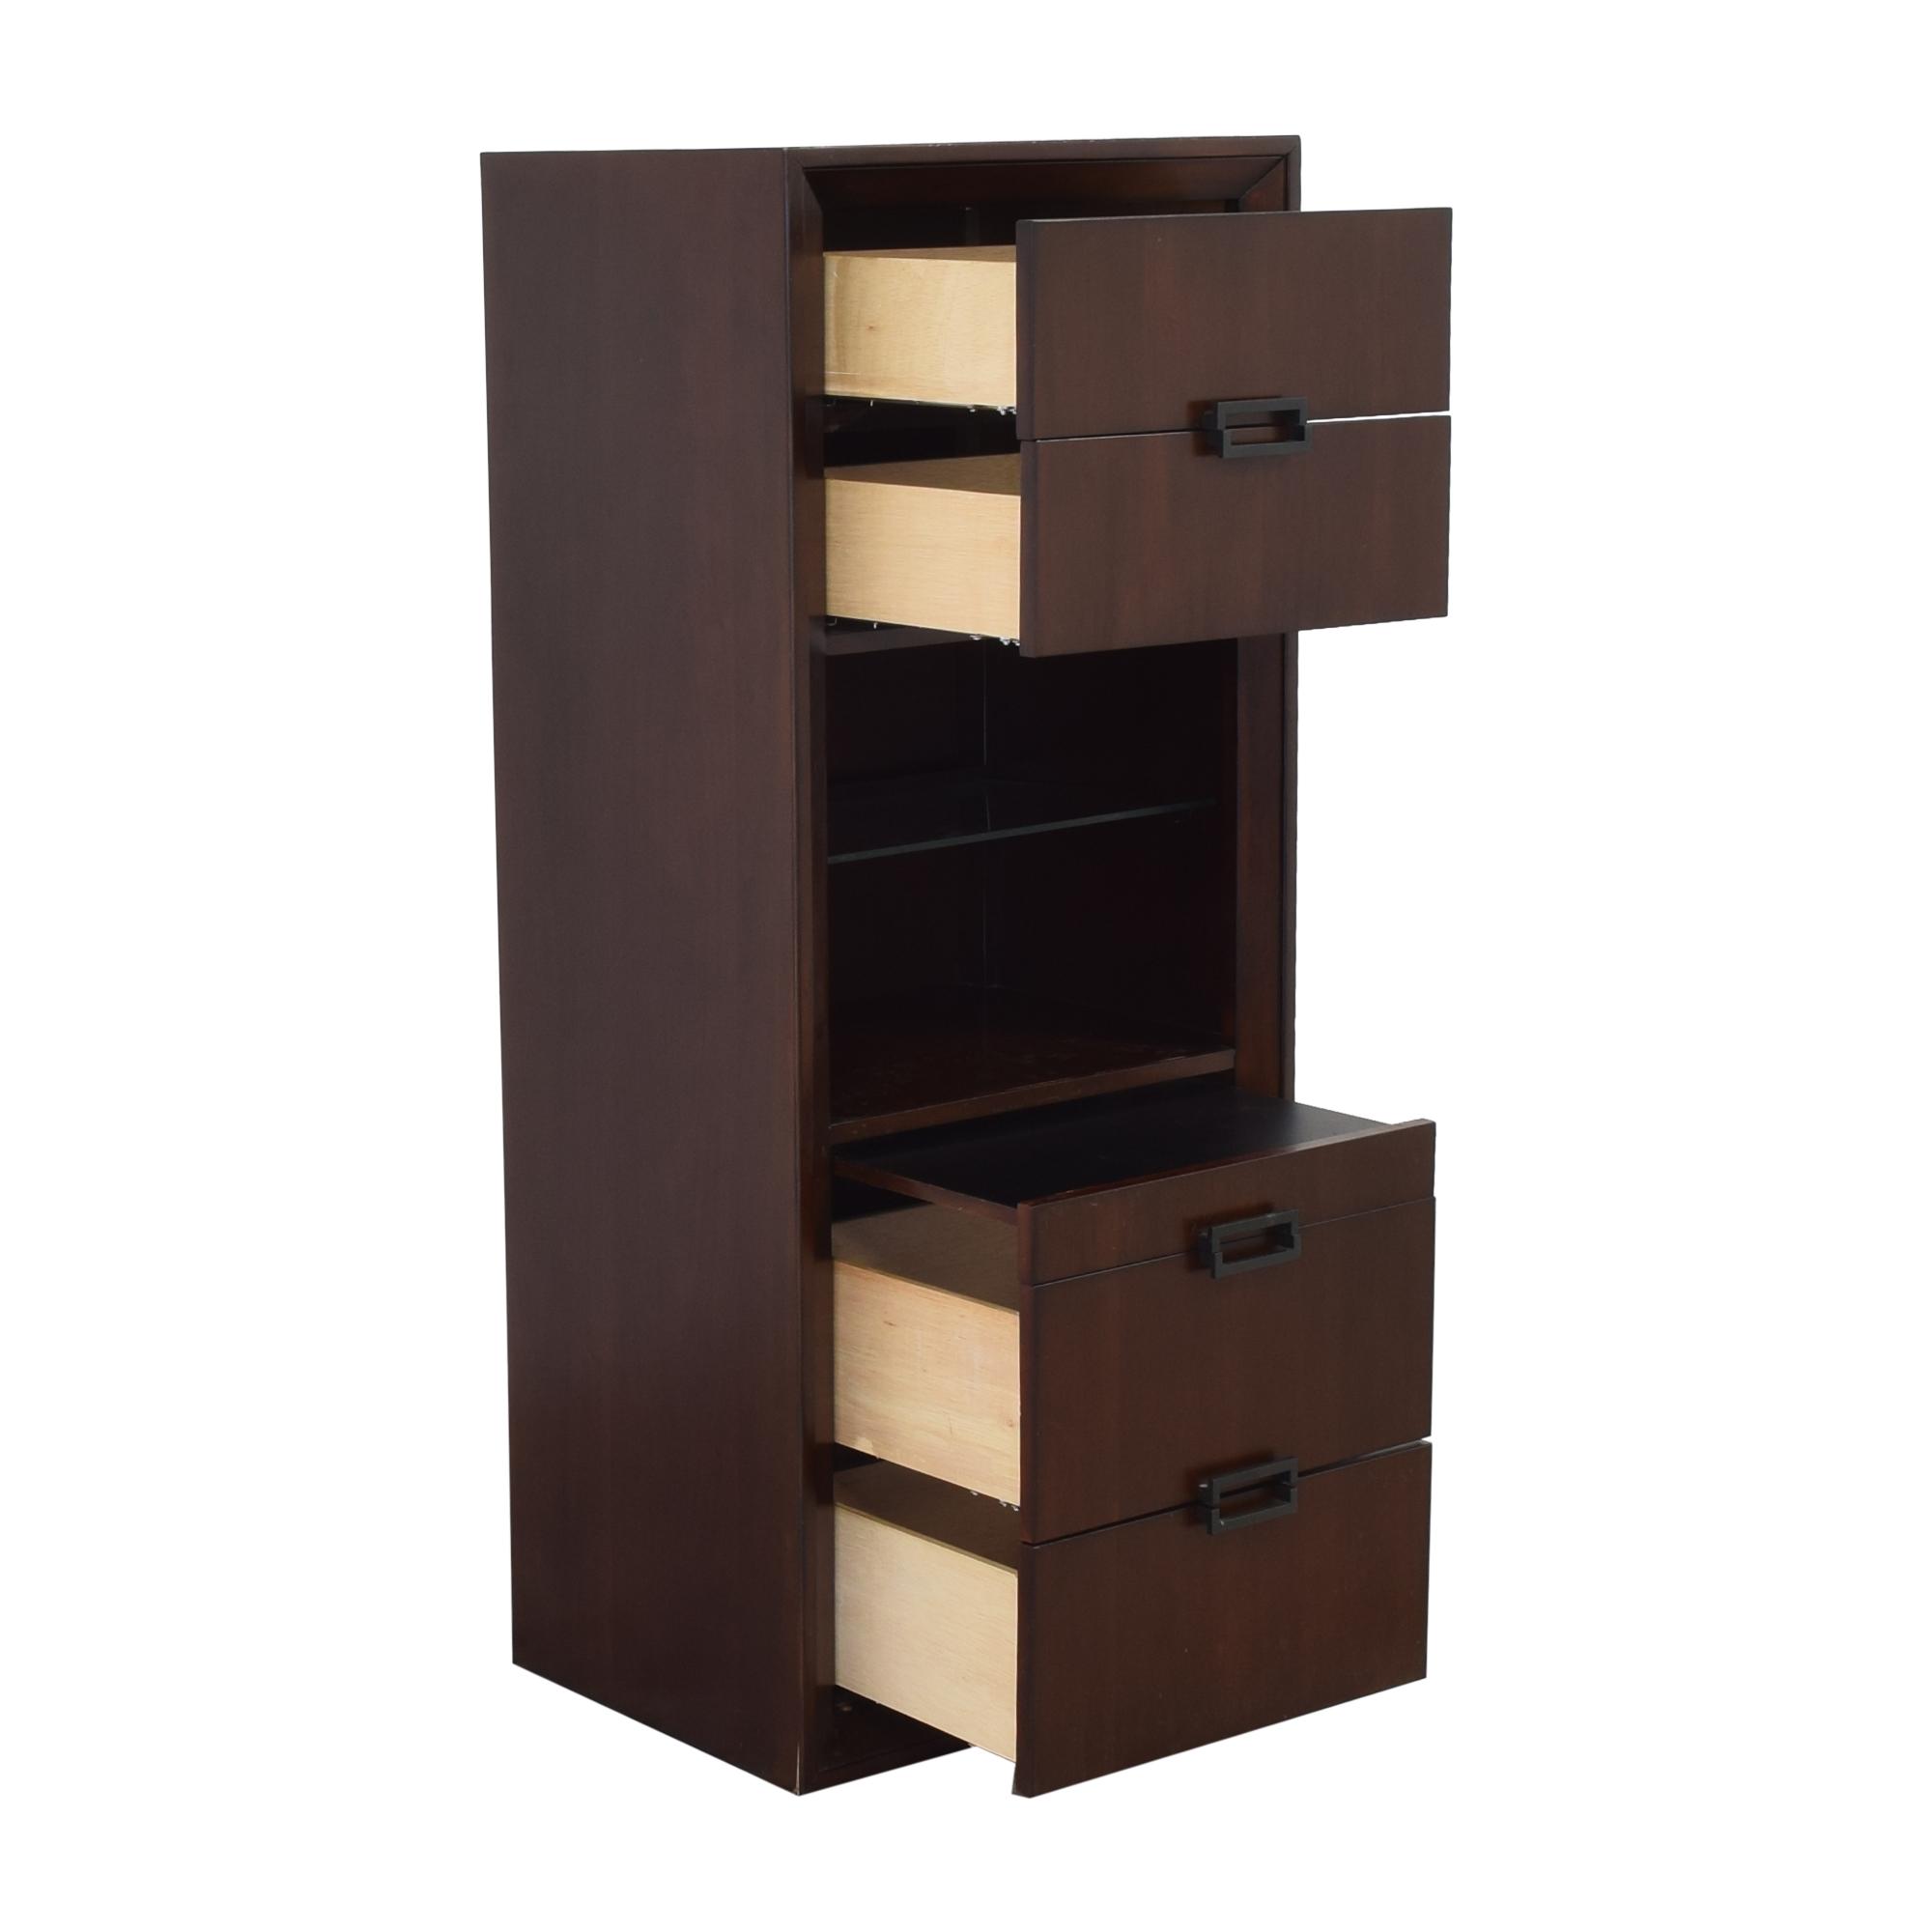 Raymour & Flanigan Raymour & Flanigan Vista Bedside Cabinet dimensions